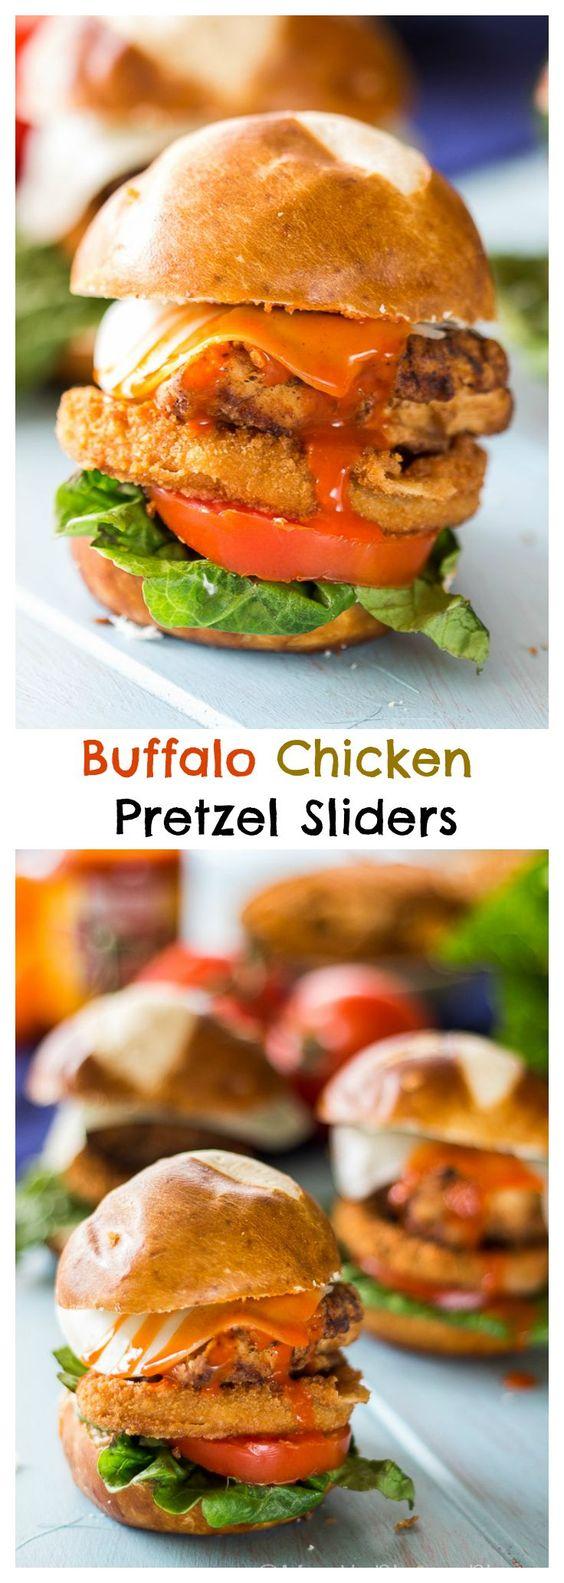 ... cheese pretzels summer parties chicken buns sauces minis cheese